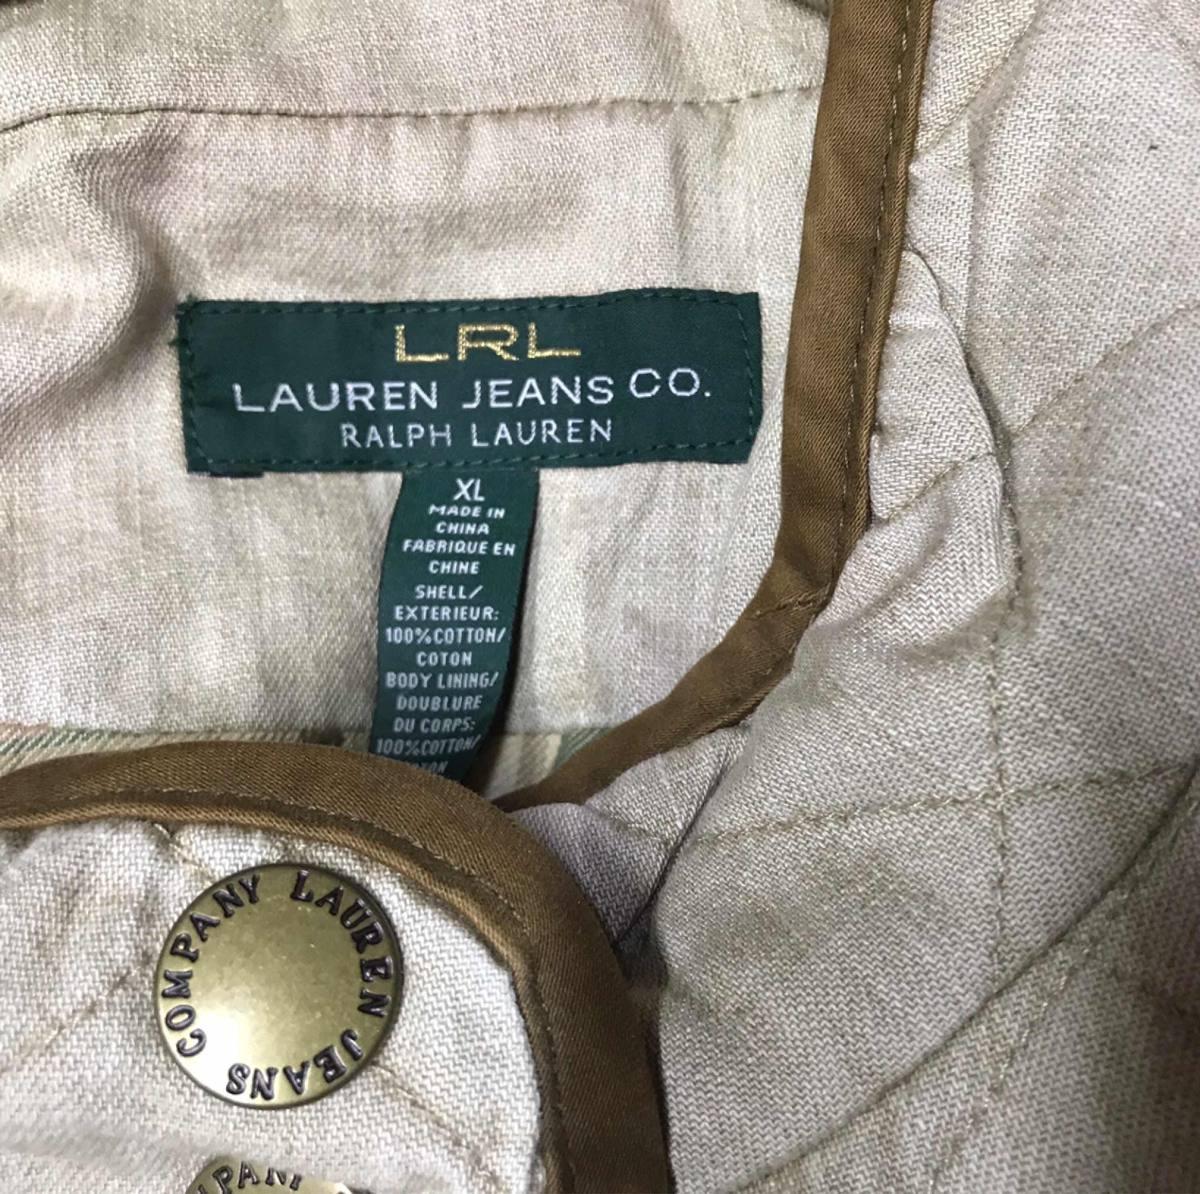 factory price official supplier best shoes Chamarra Premium Algodon Lrl Lauren Jeans Co Ralph Lauren Xl - $ 1,499.00